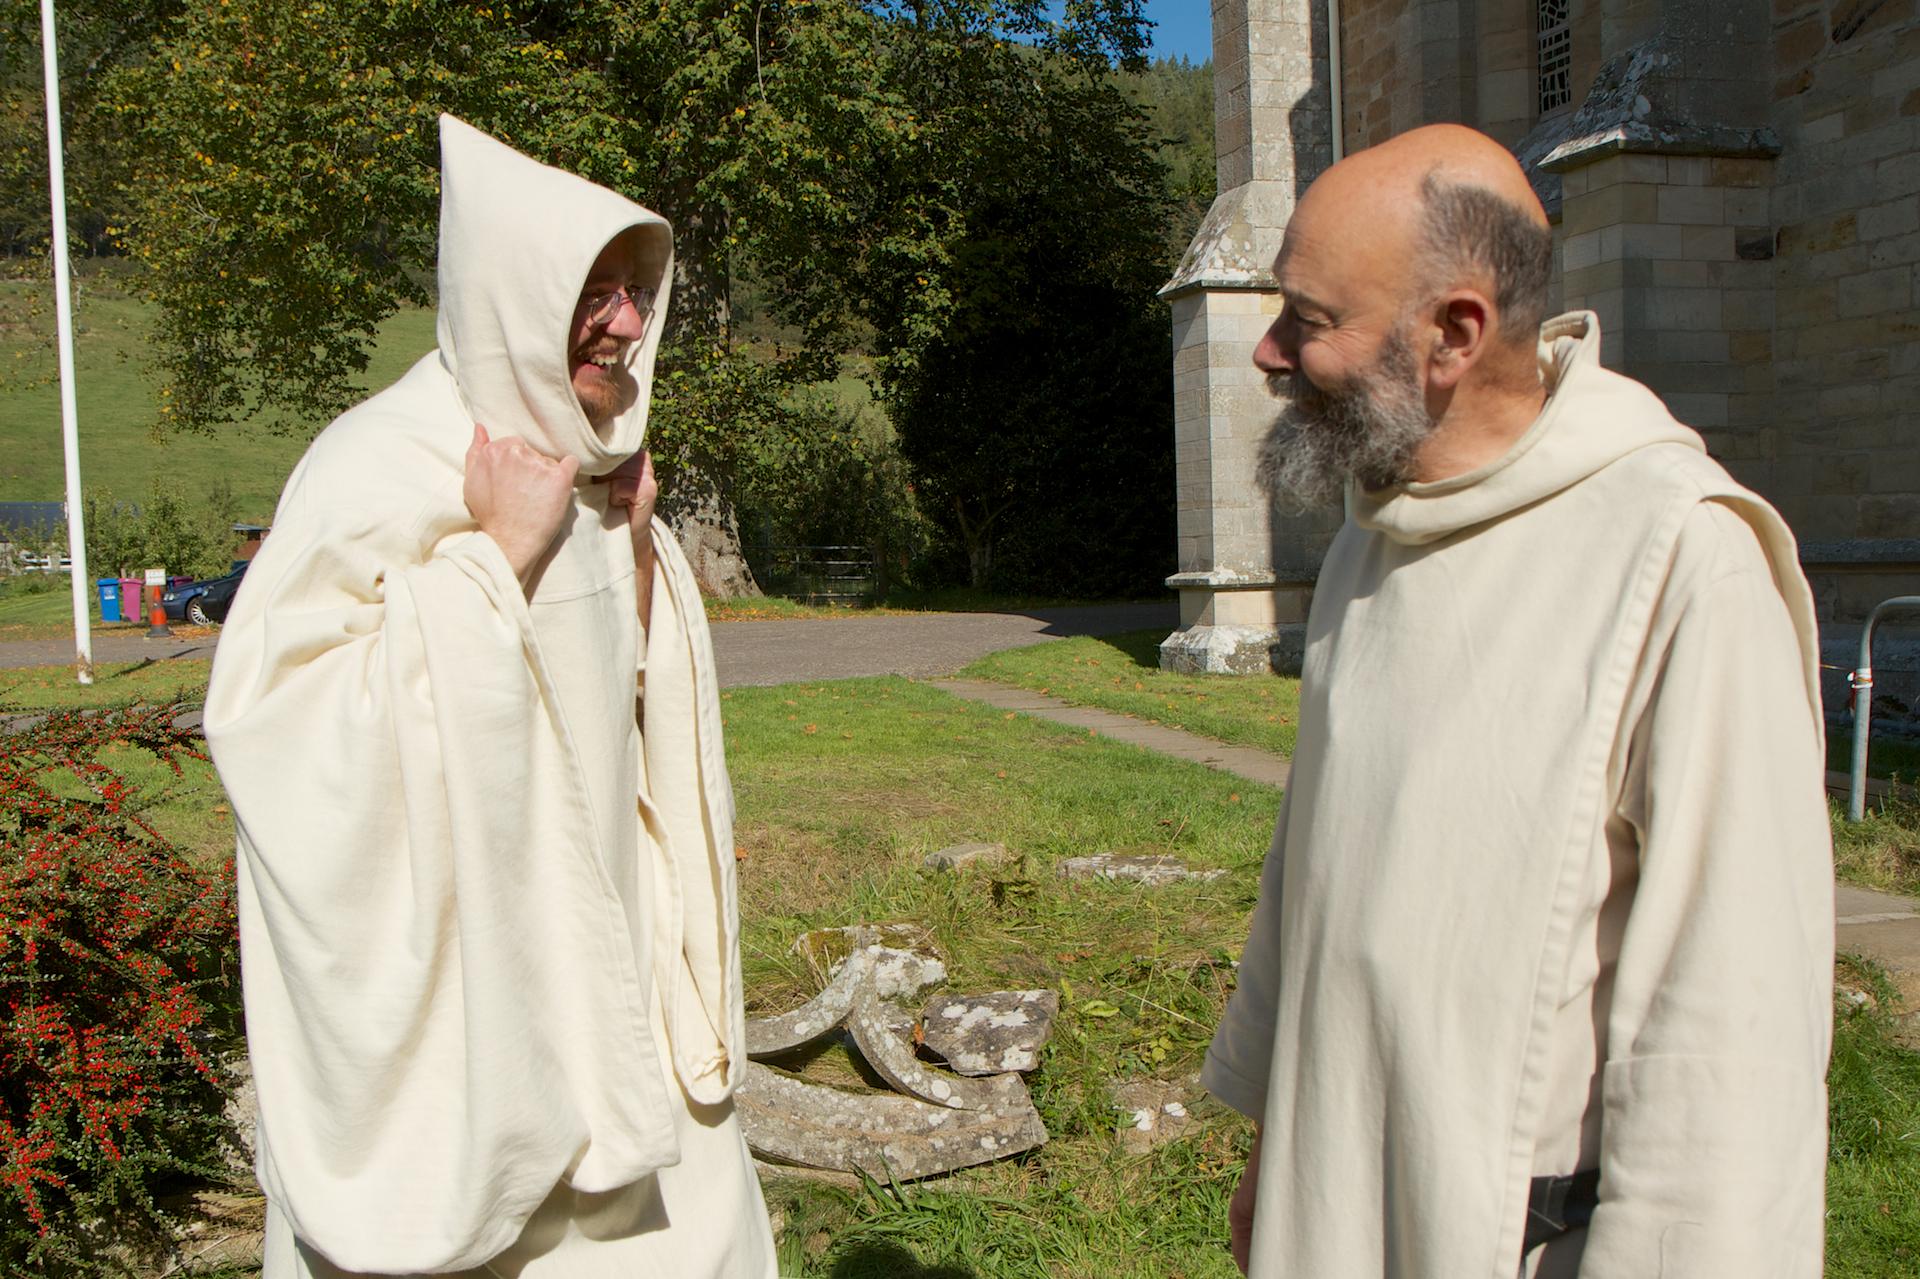 White-habited Benedictine monks of Pluscarden